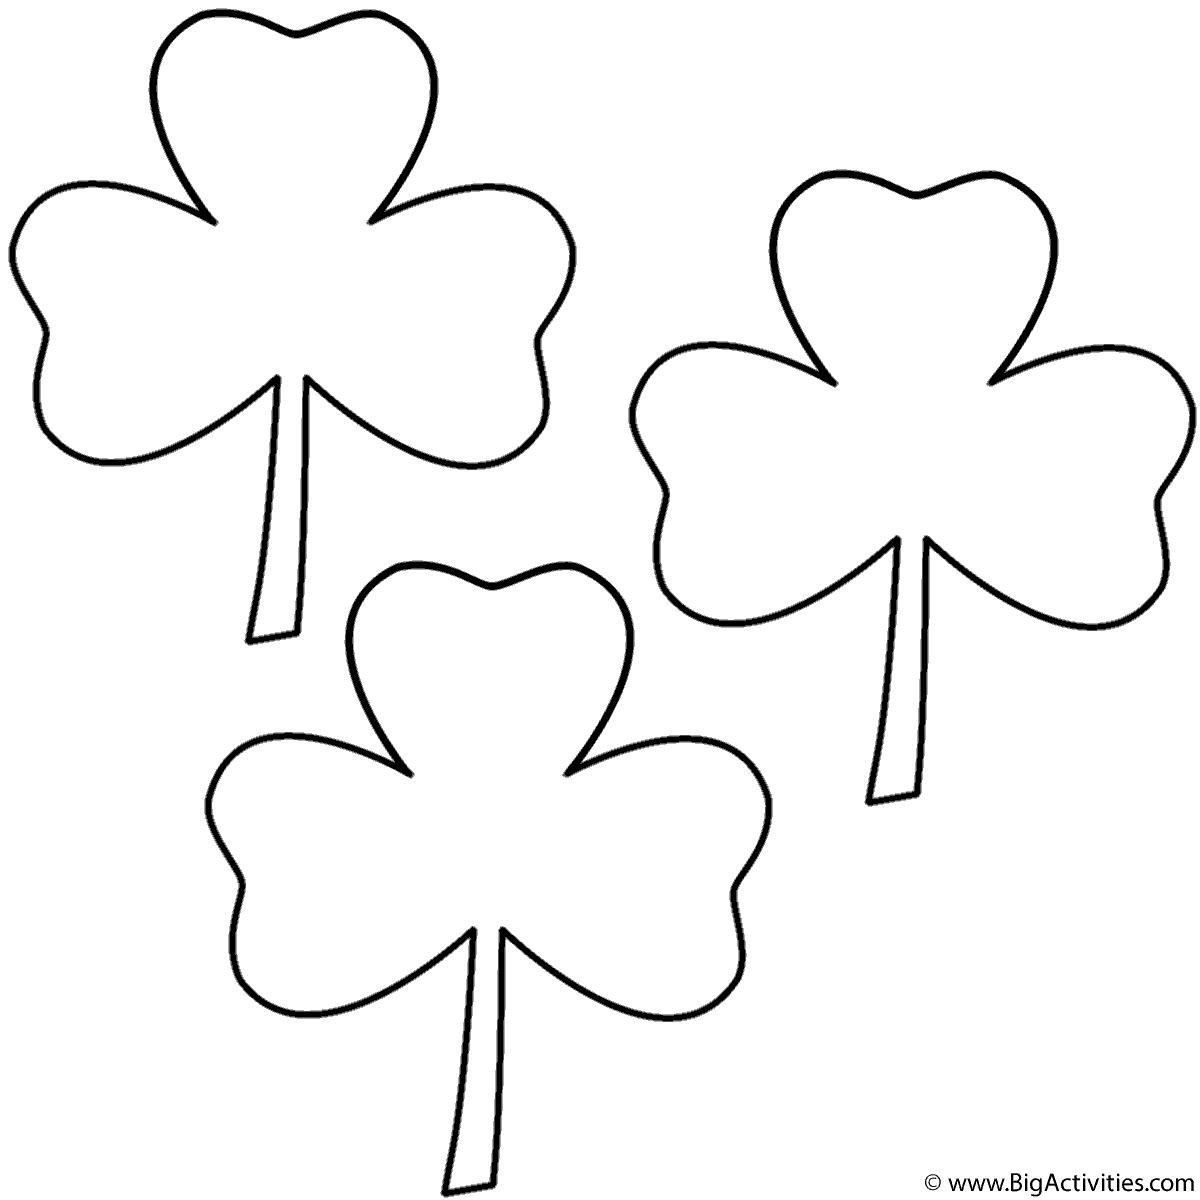 Three Leaf Clovers 3 Clovers